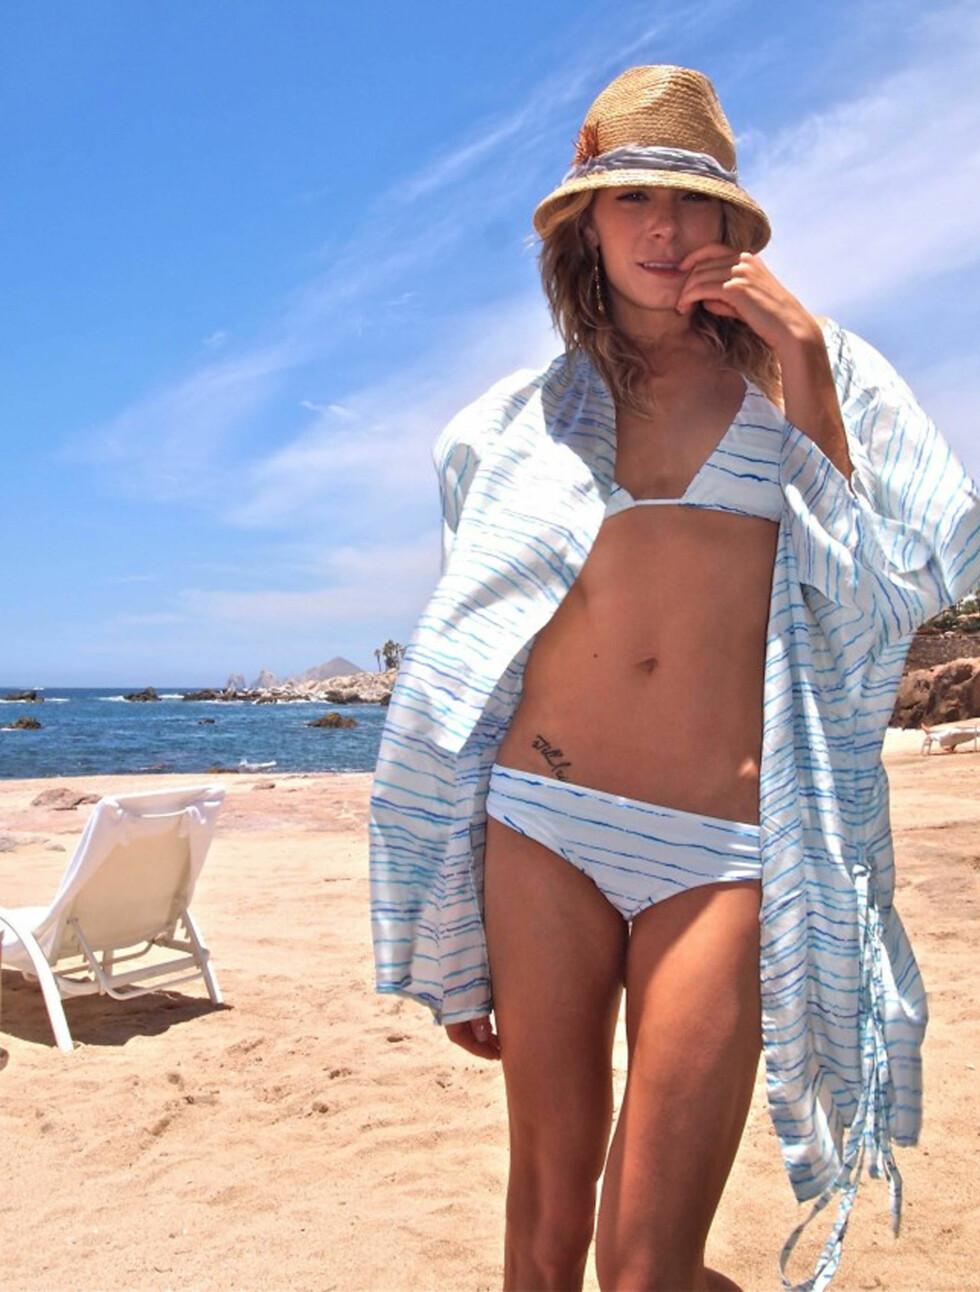 BIKINIMODELL: LeAnn Rimes poserer for bikinimerket MIKOH i en ny reklamekampanje. Foto: Stella Pictures